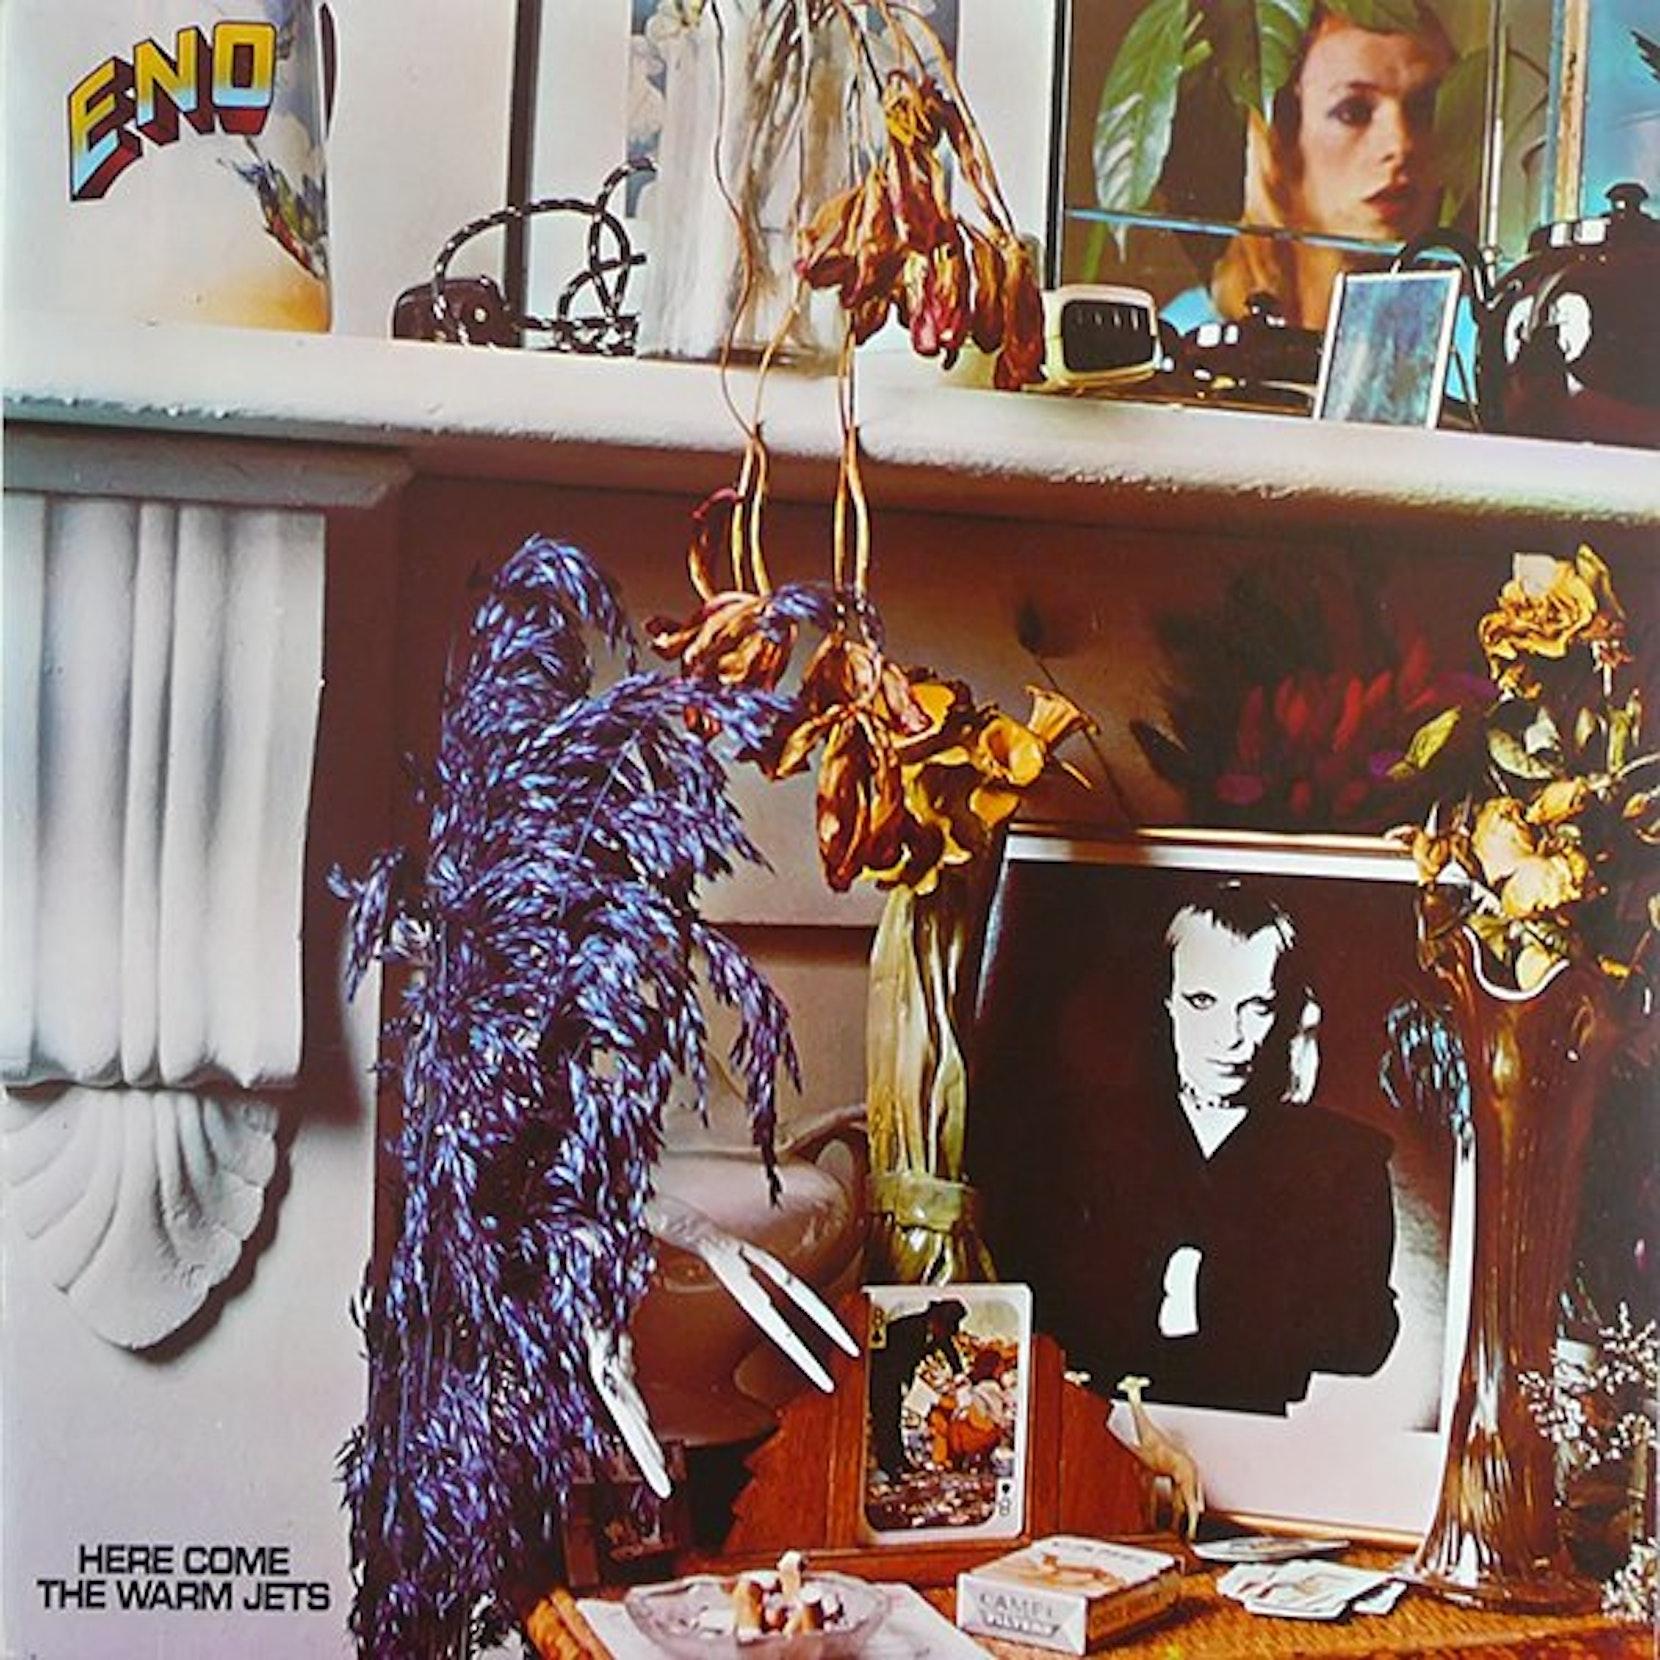 The 10 Best Brian Eno Albums To Own On Vinyl — Vinyl Me, Please